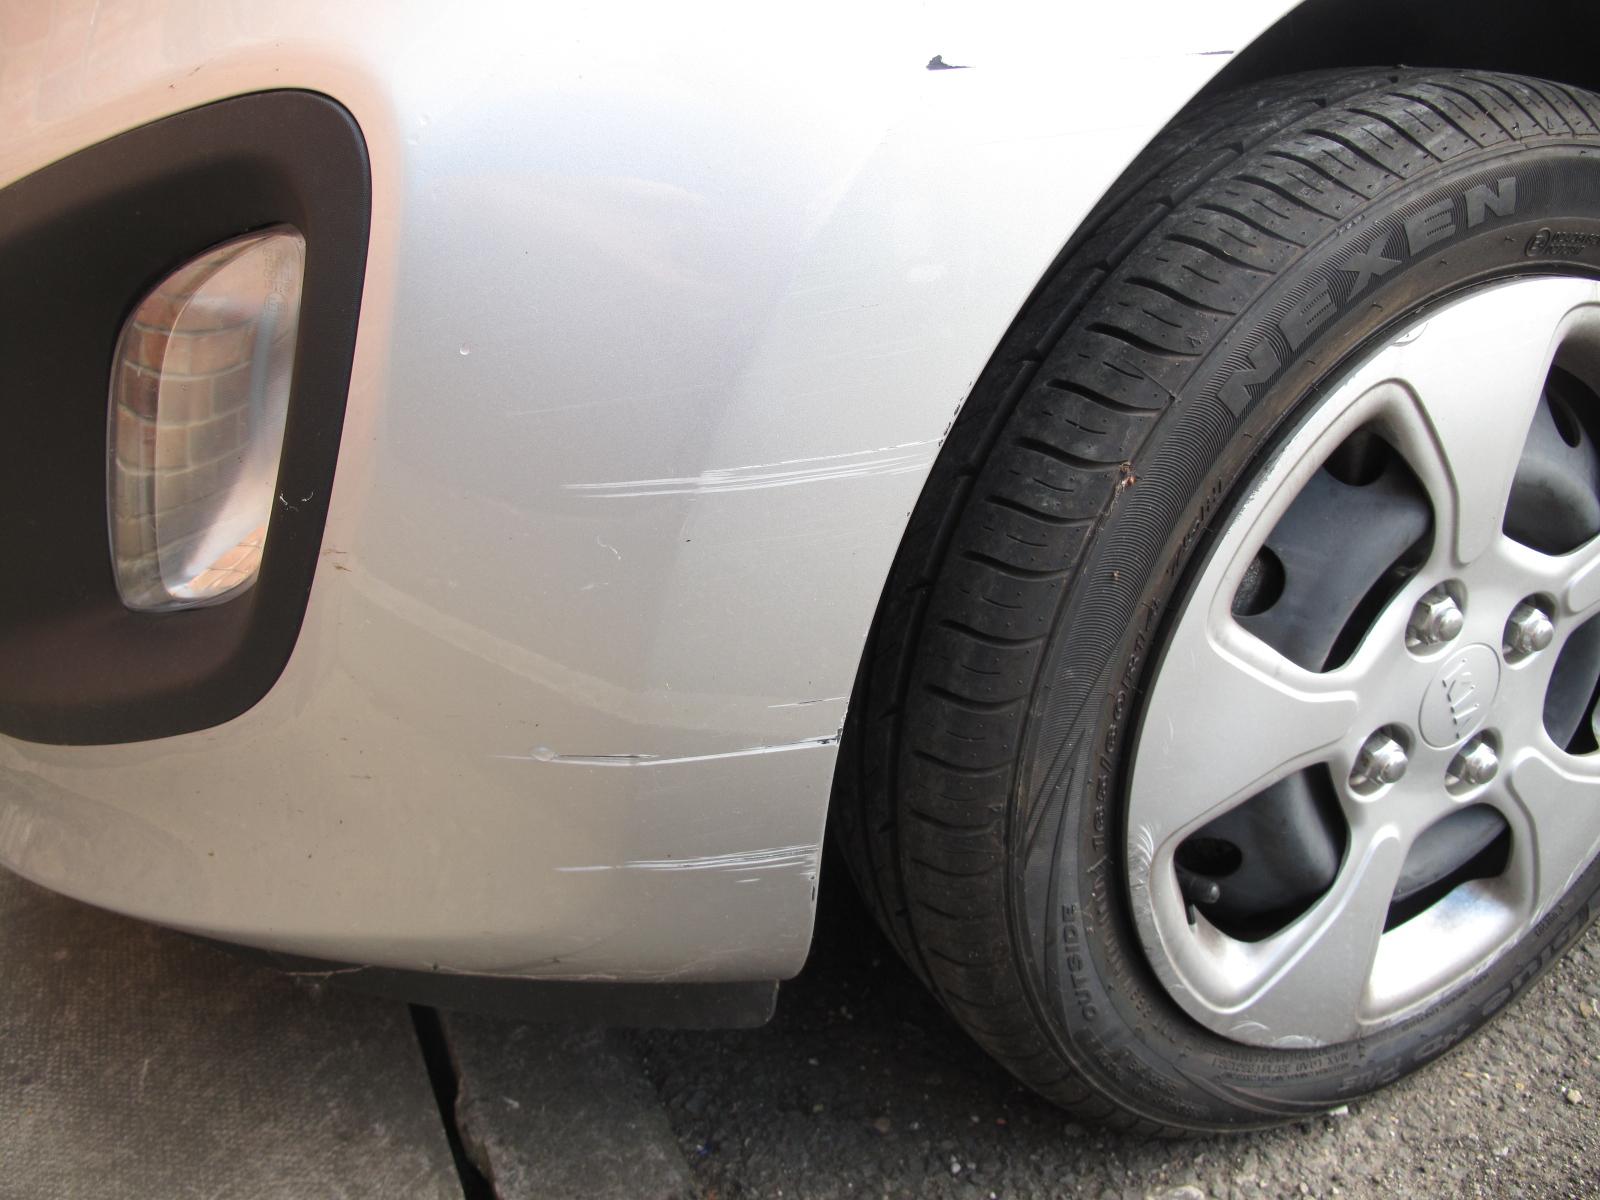 [YR12 YCN] 2012 Kia Picanto 1.0 petrol, 5-door hatchback in Silver, 13,787 Miles, 1 previous keeper, - Image 5 of 6